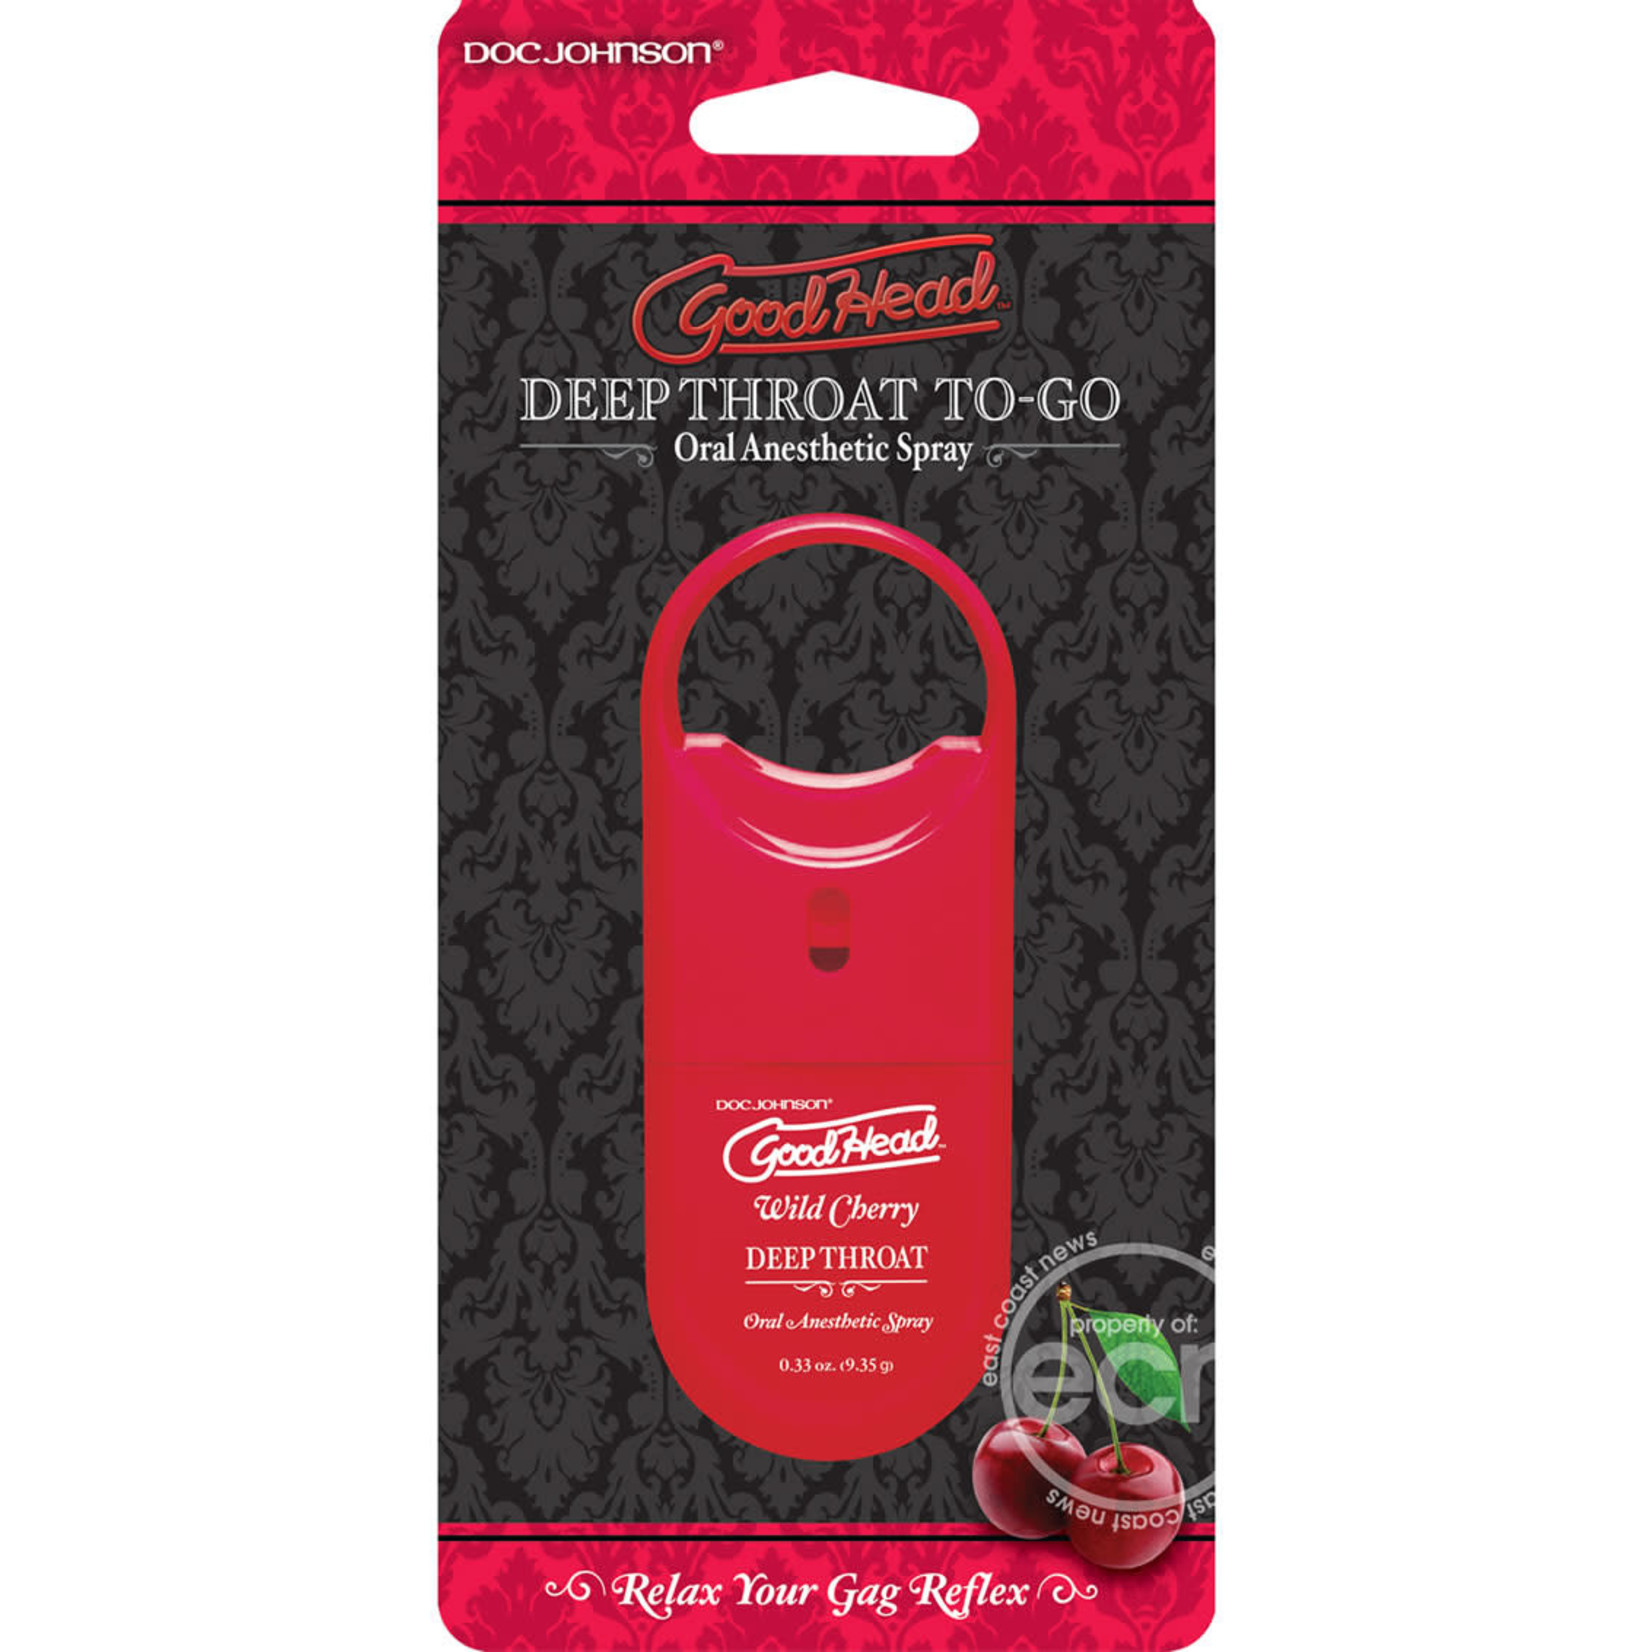 Goodhead Deep Throat To-Go Oral Anesthetic Spray Cherry .33oz